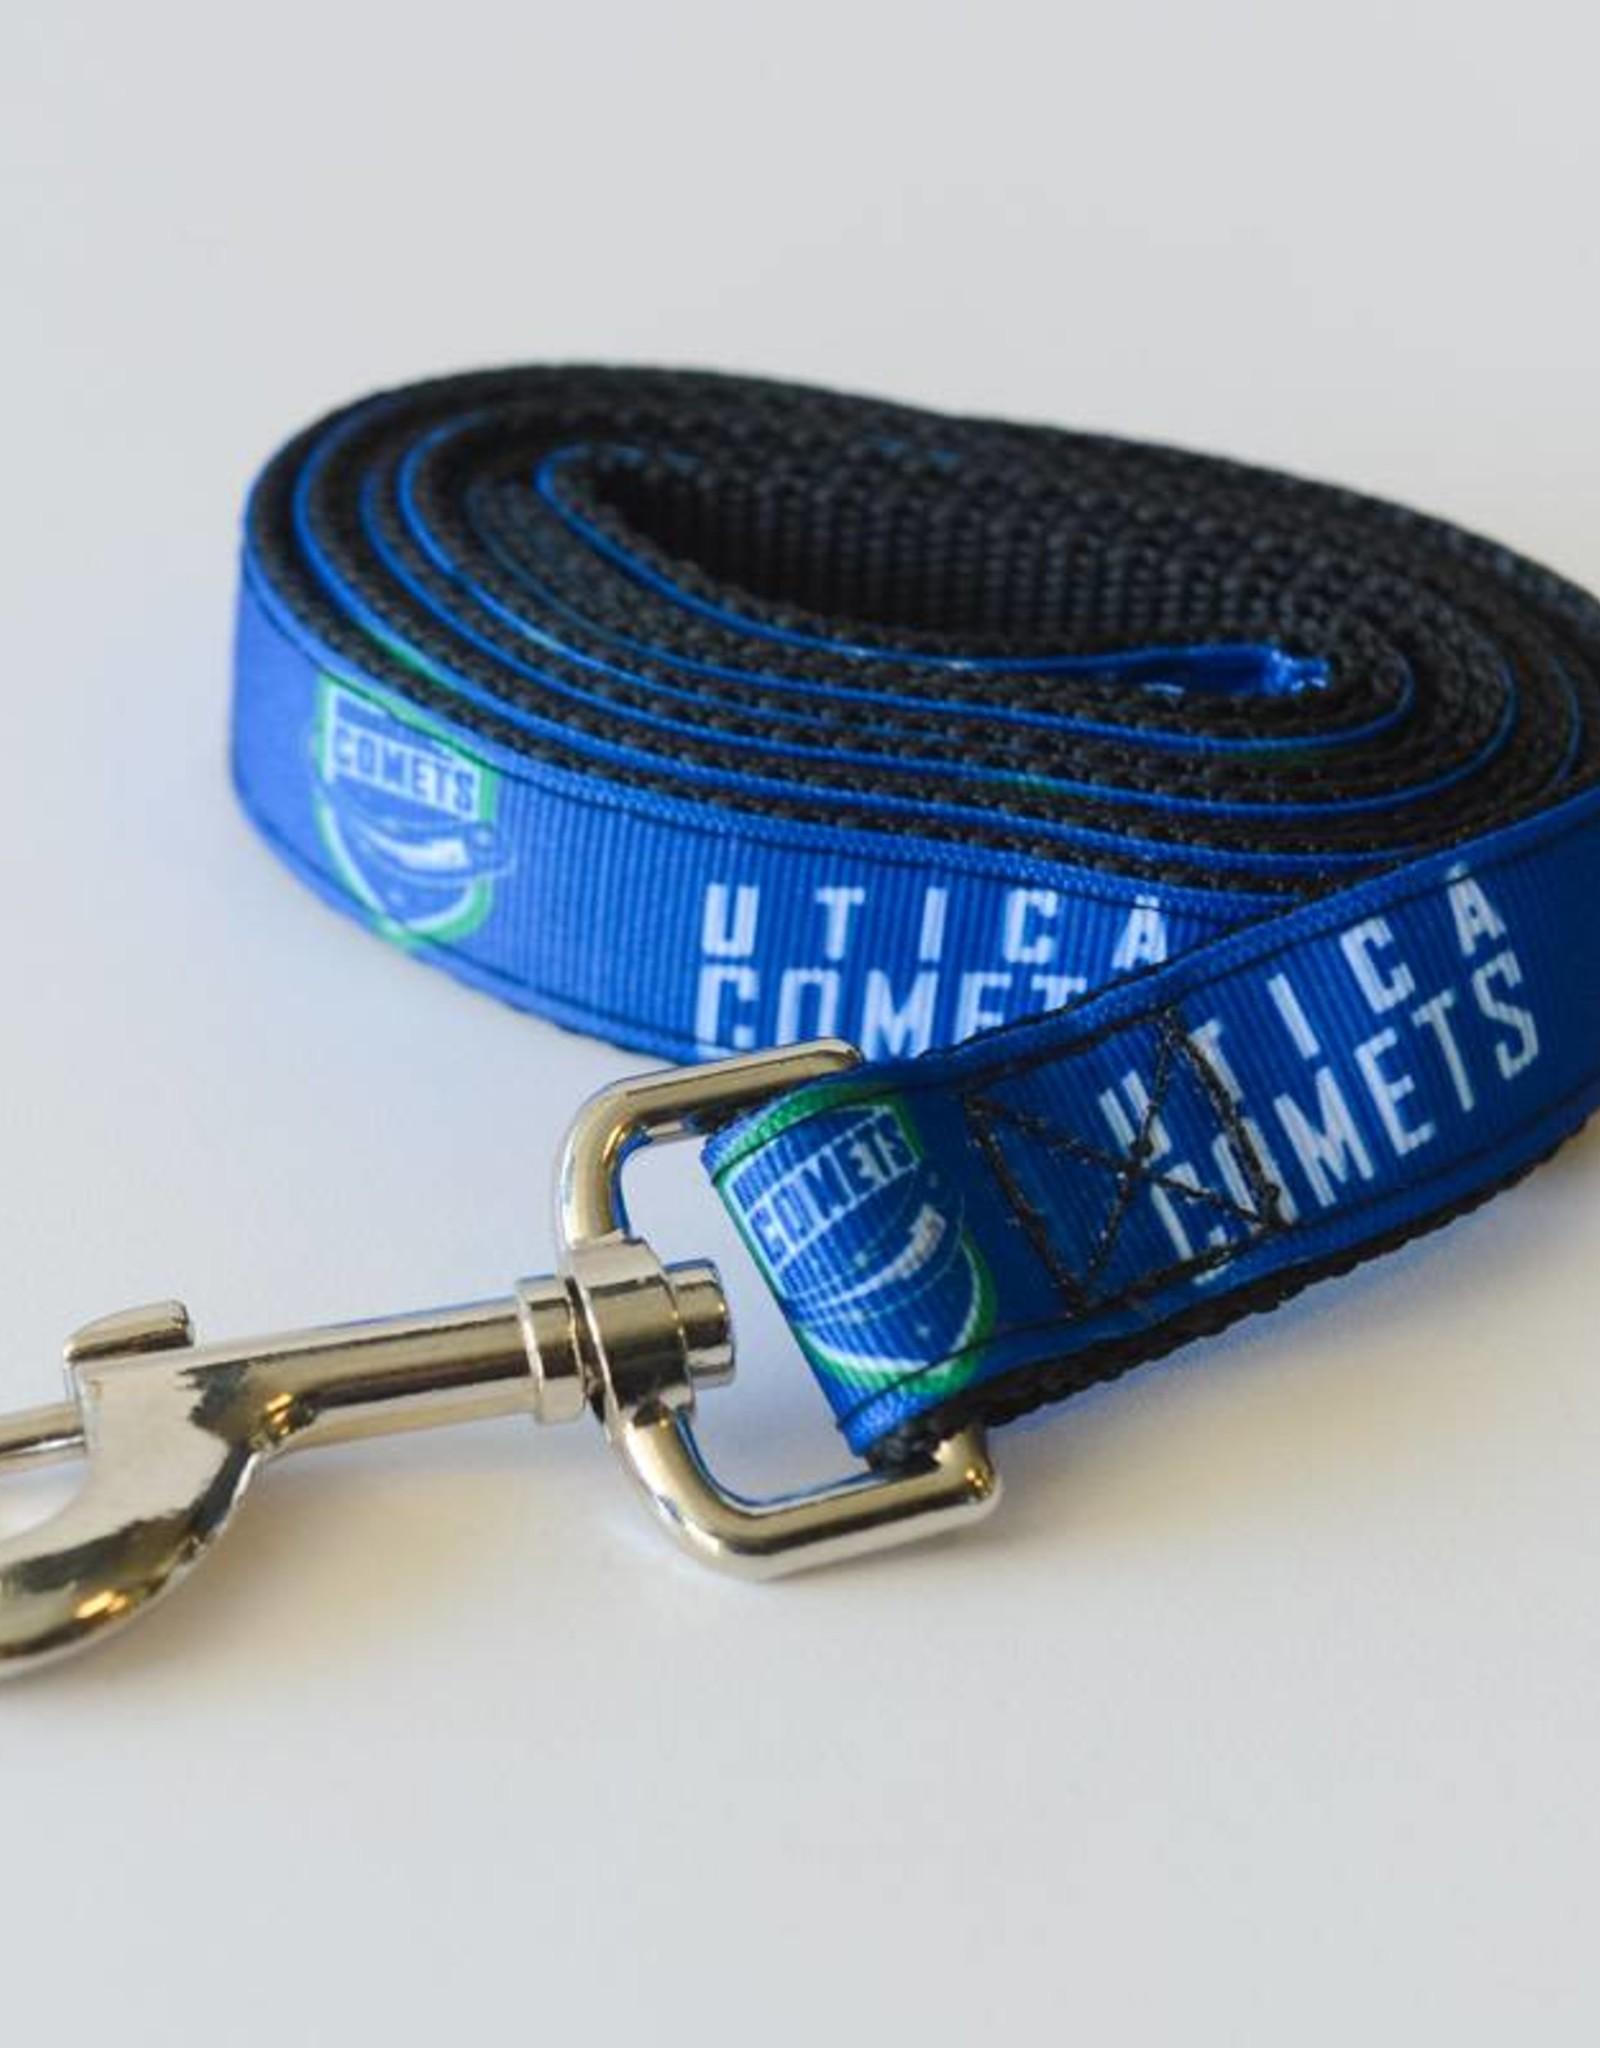 All Star Dogs Utica Comets Dog Leash